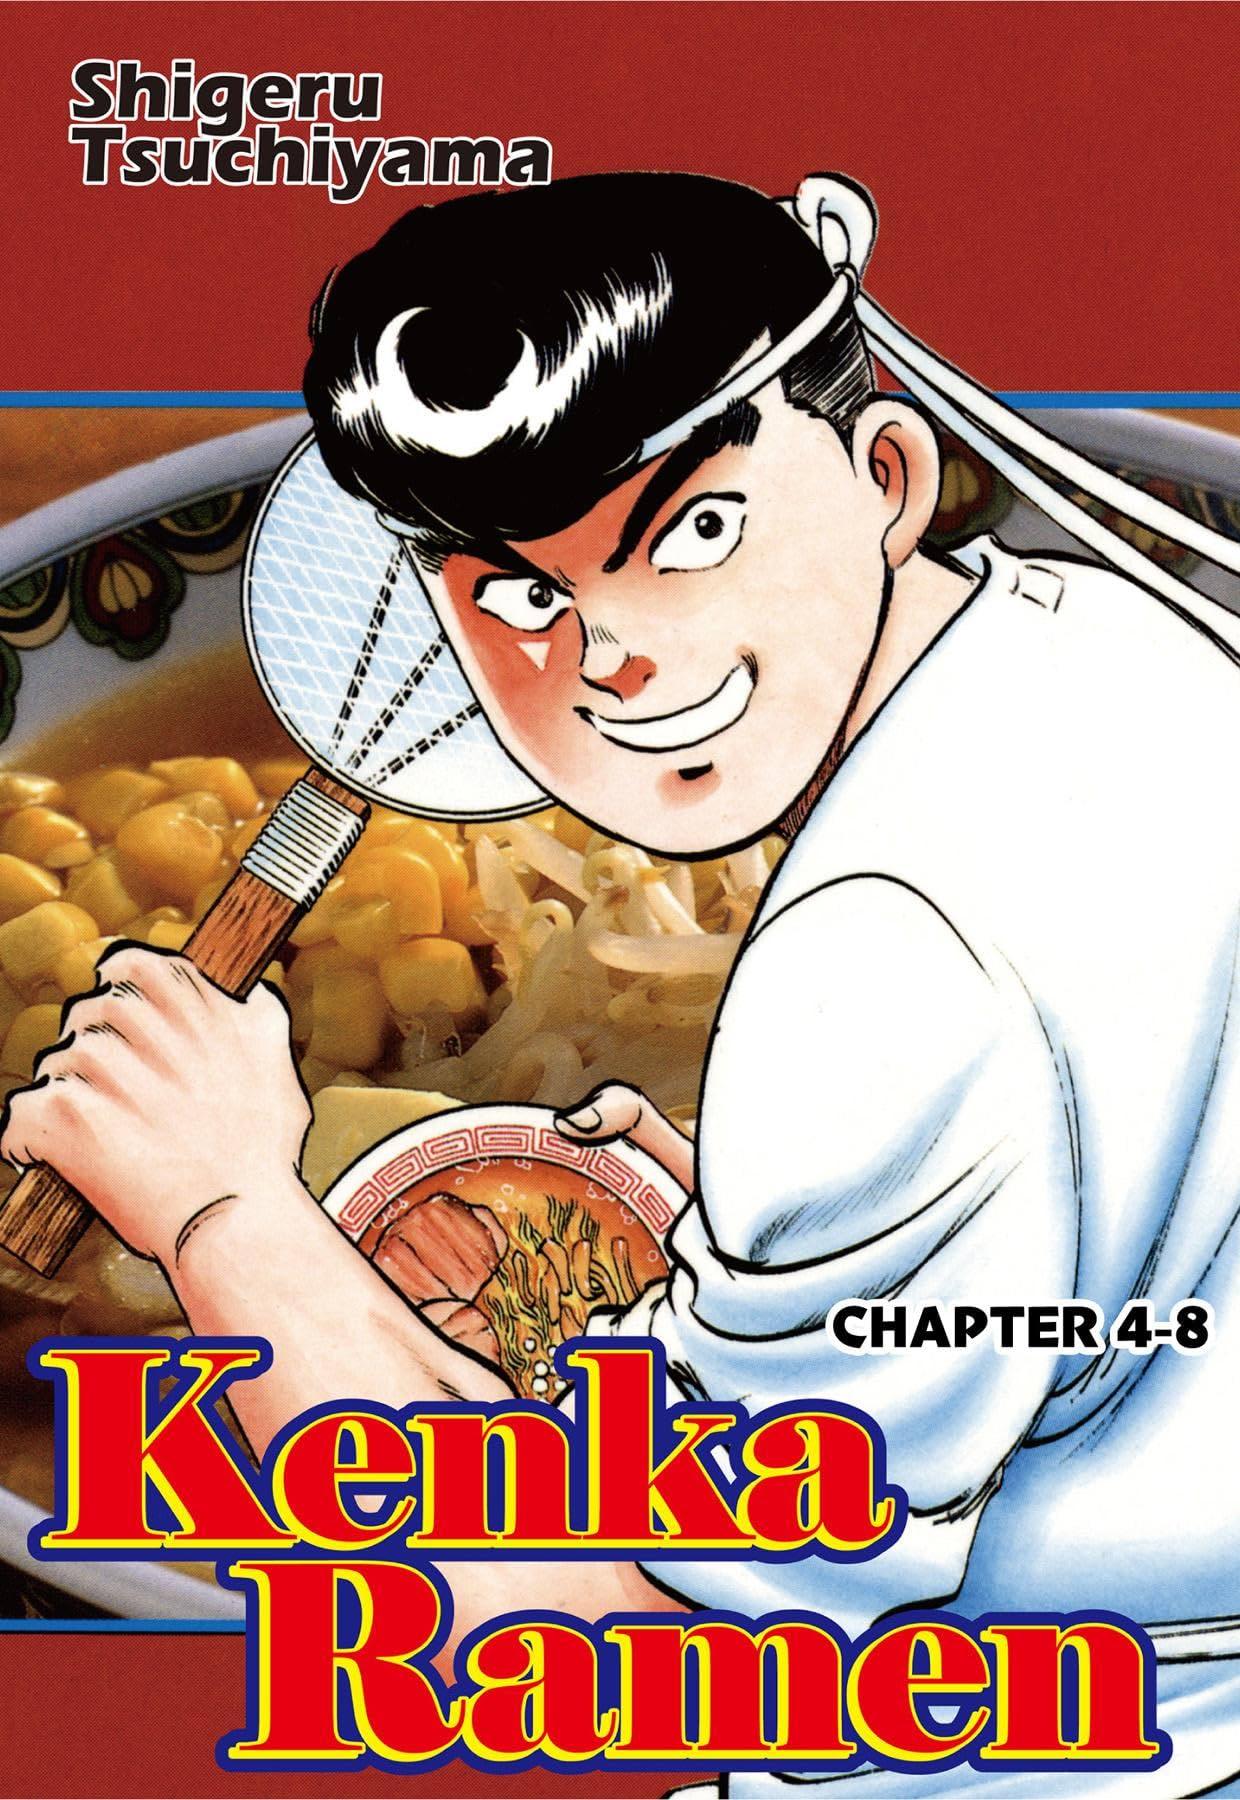 KENKA RAMEN #35